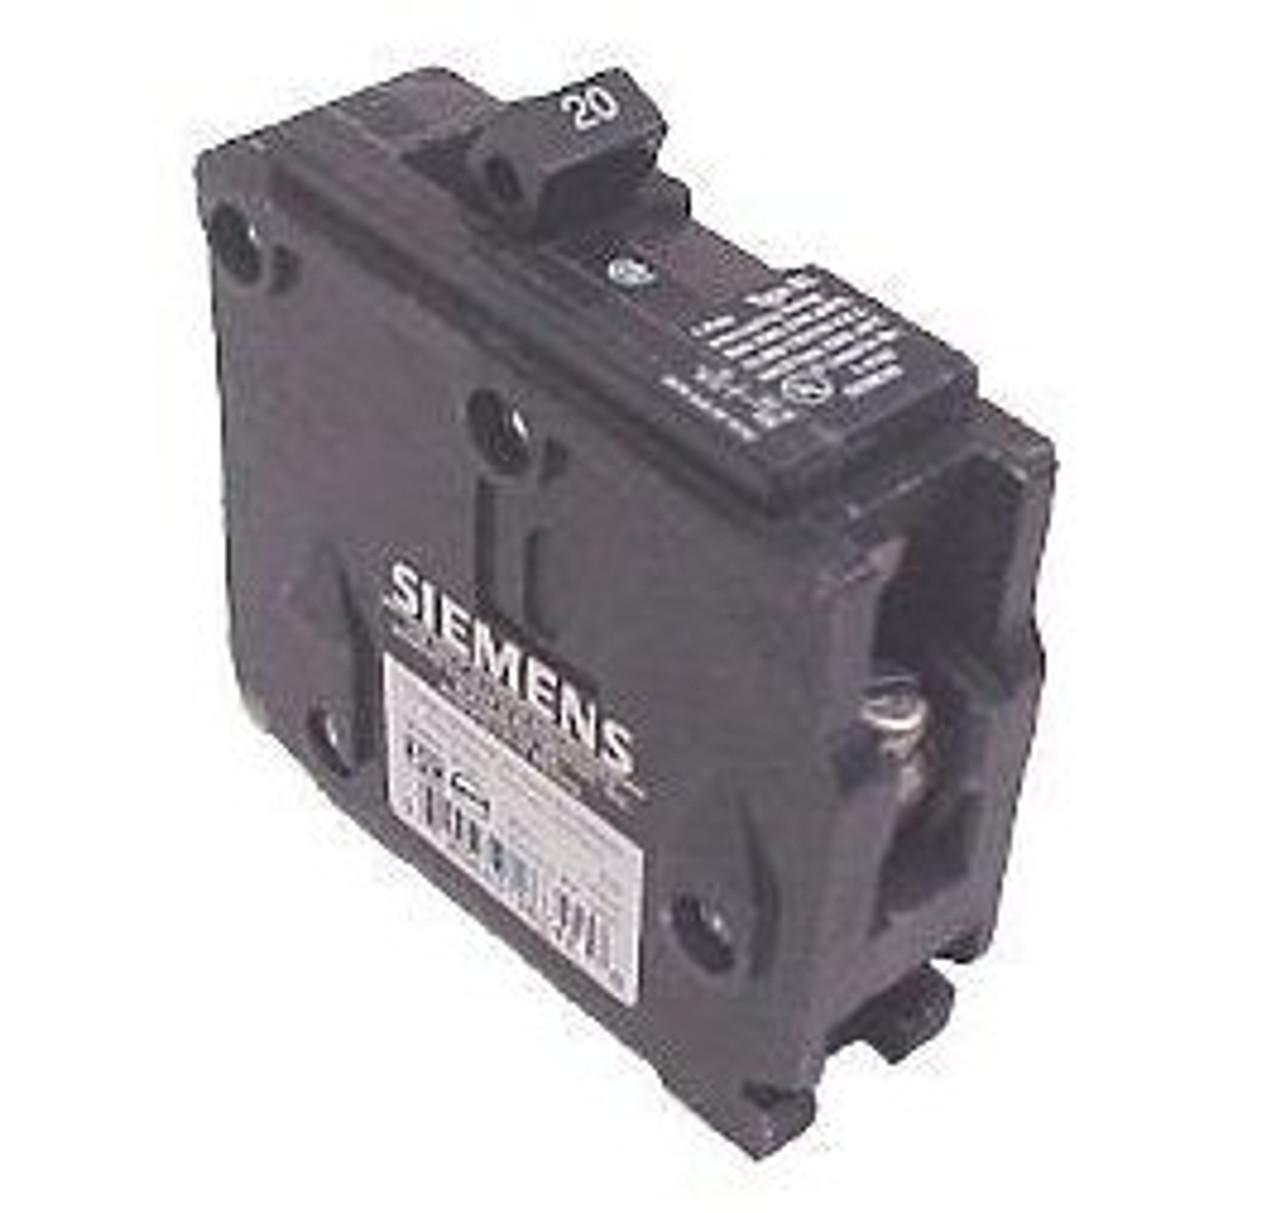 Siemens B135 1 Pole, 35 Amps, 120VAC, Type BL Circuit Breaker - Used